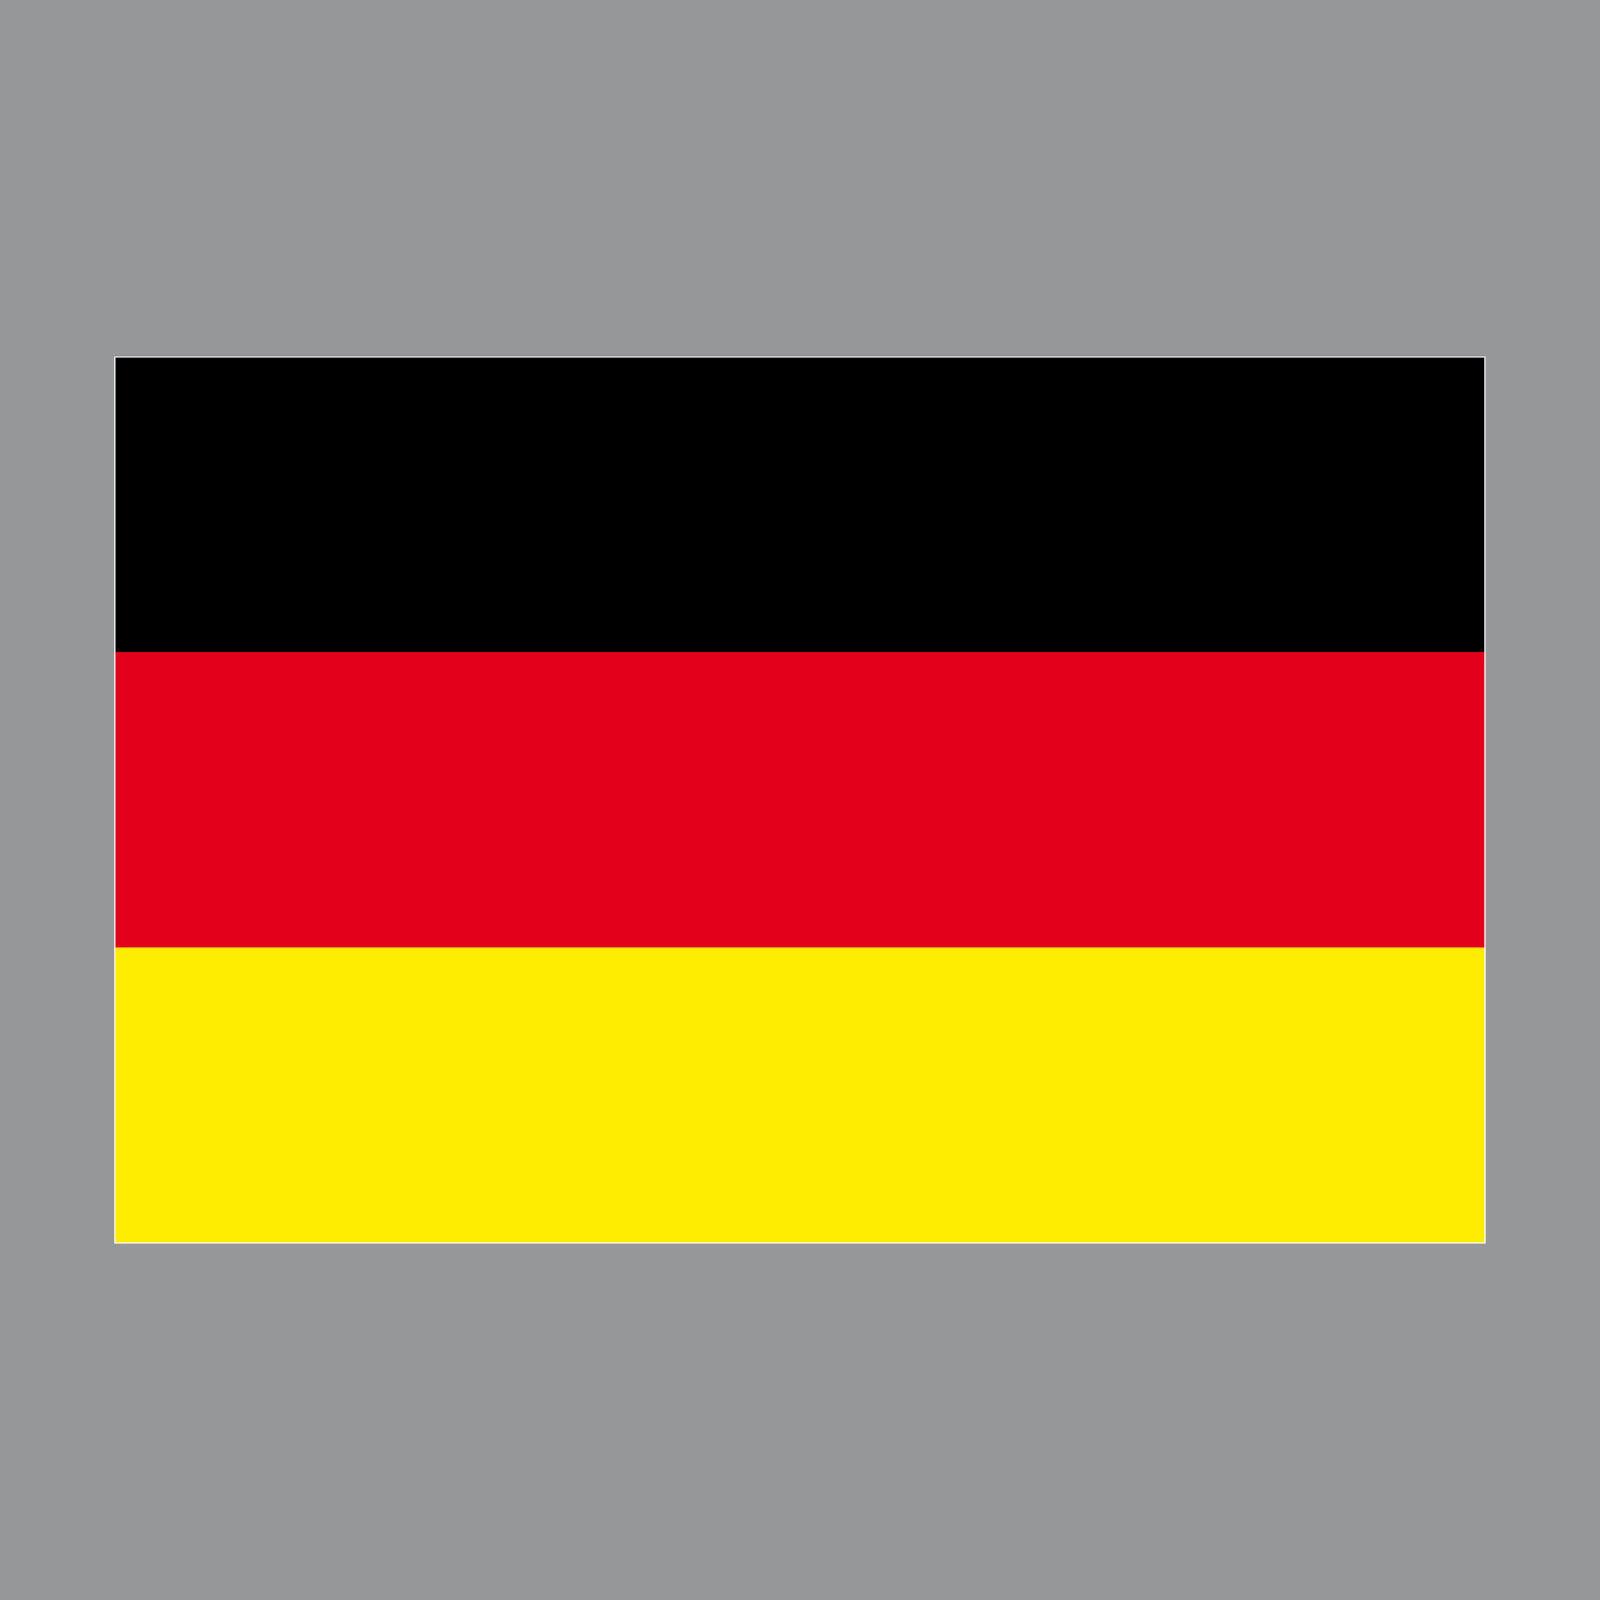 Aufkleber 8cm Sticker D Brd Deutschland Flagge Fahne Fussball Fan Em Wm Deko